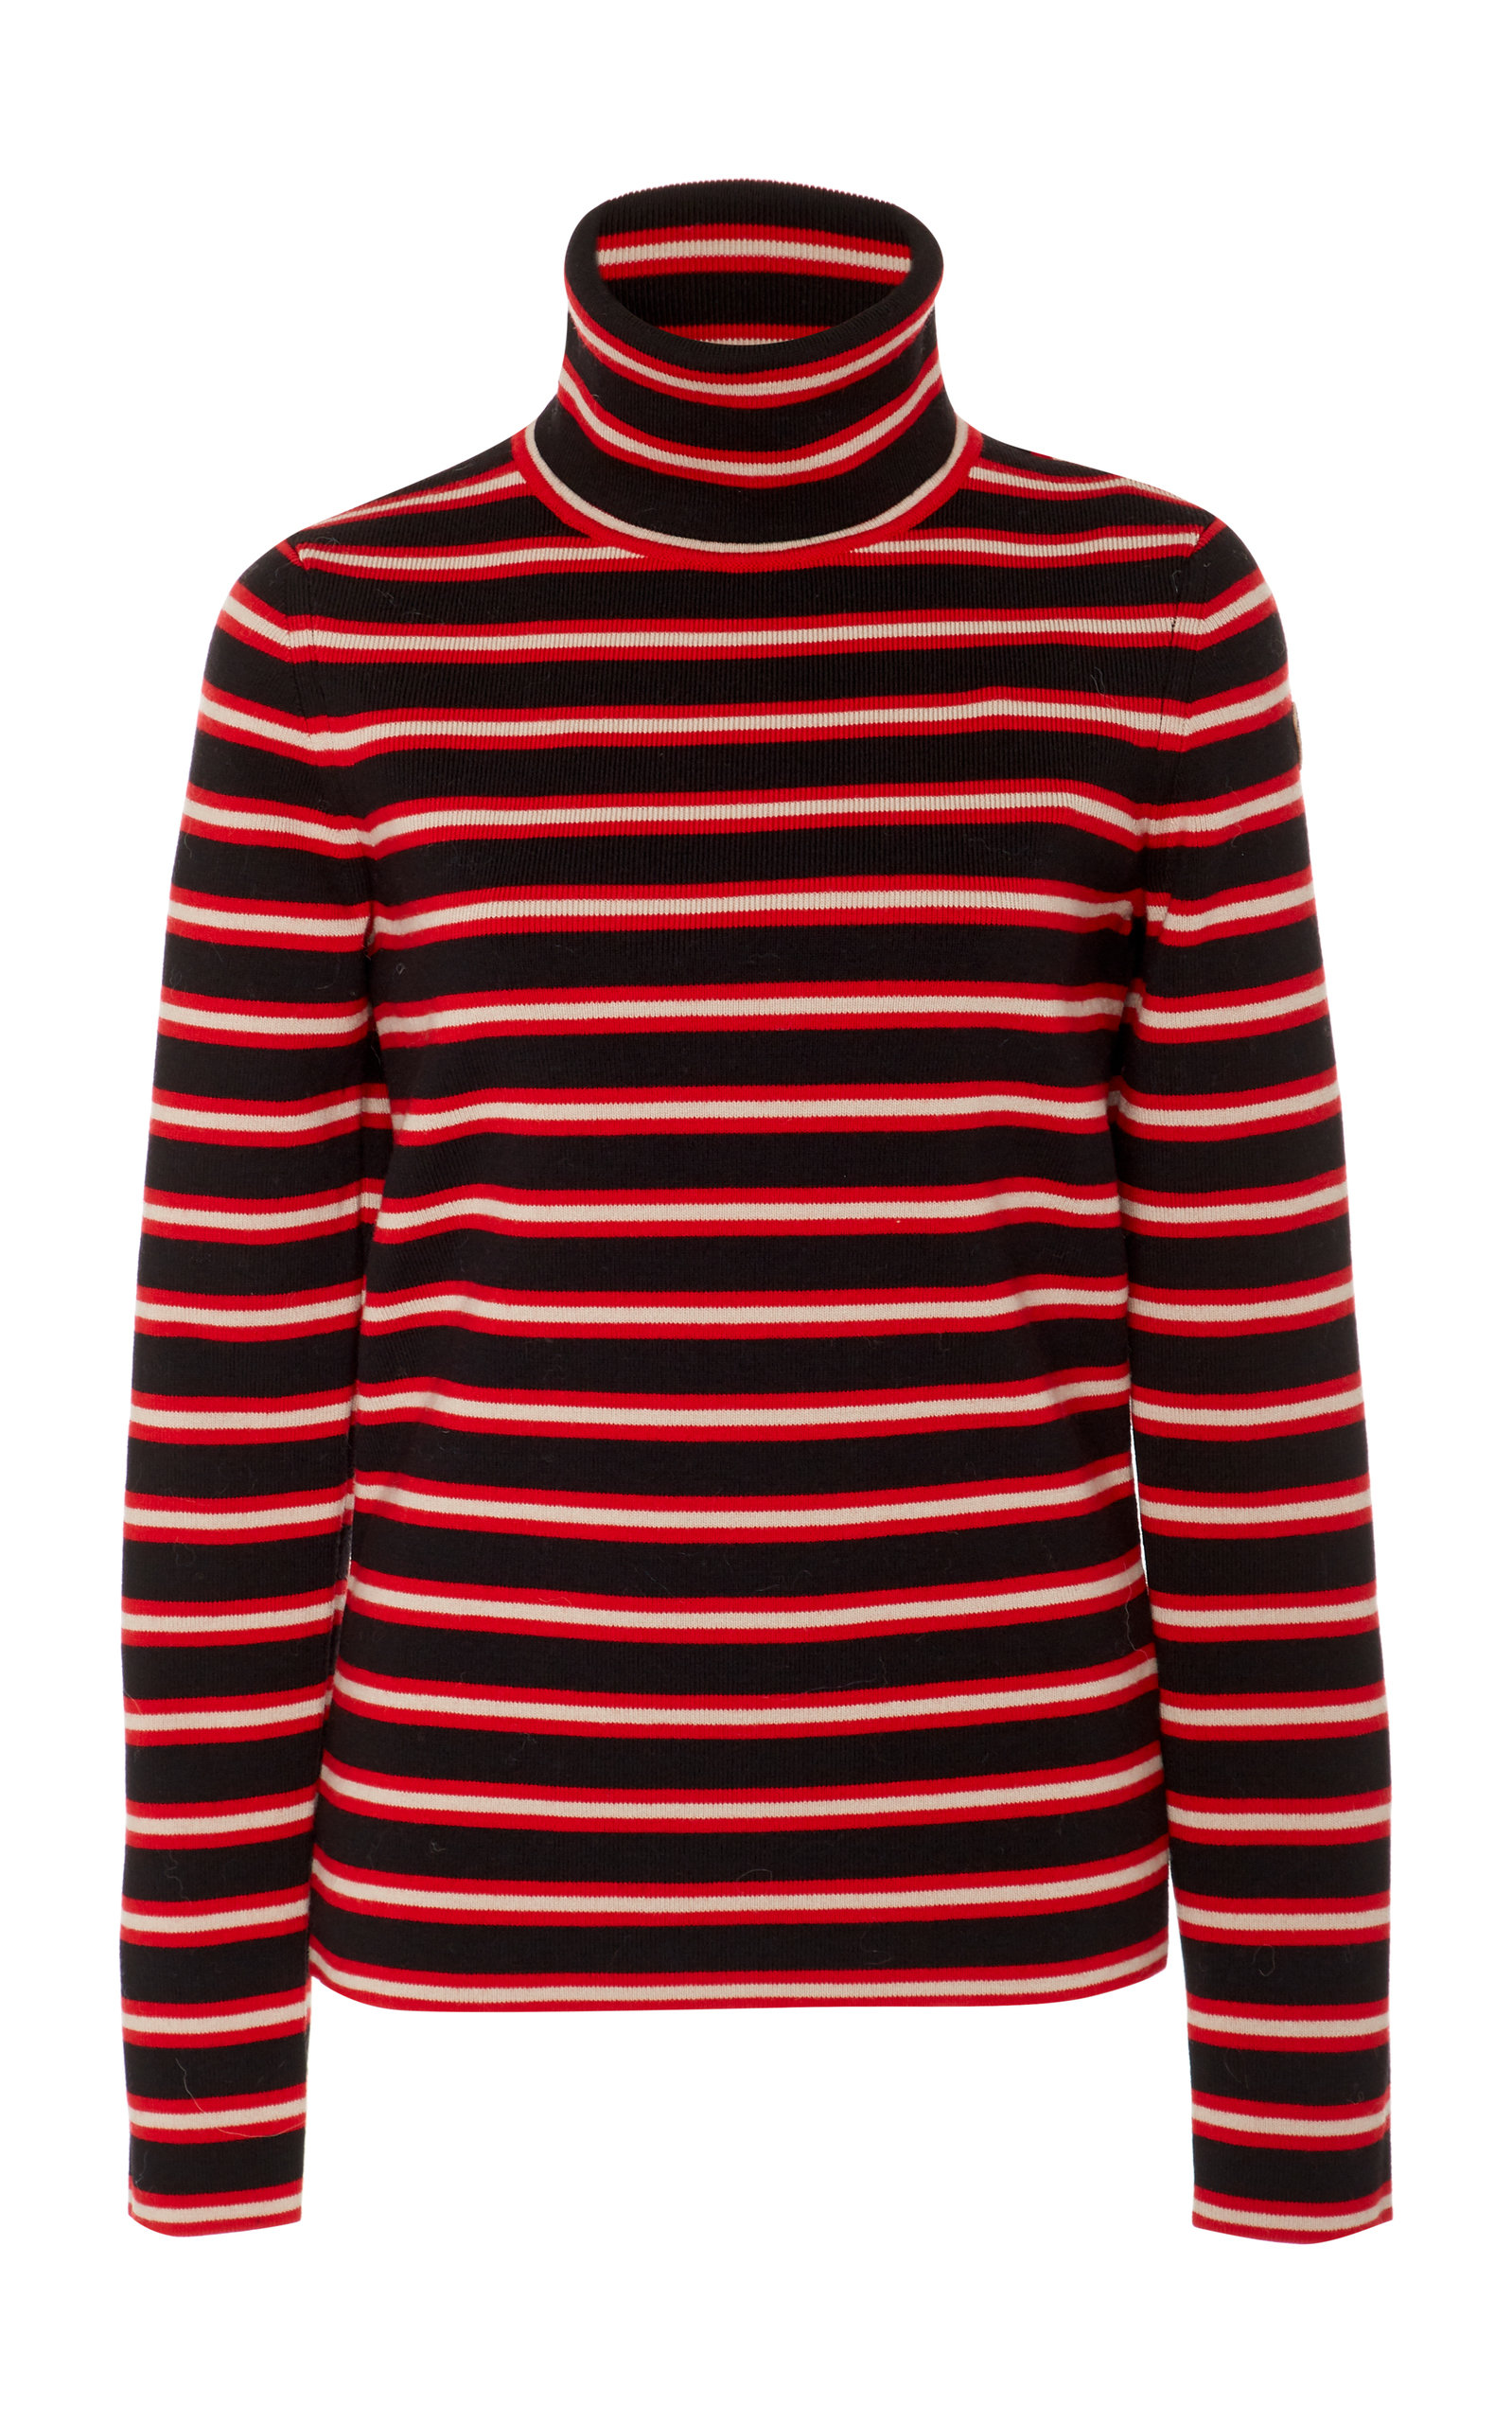 Moncler GeniusStriped Stretch-Wool Turtleneck Sweater. CLOSE. Loading